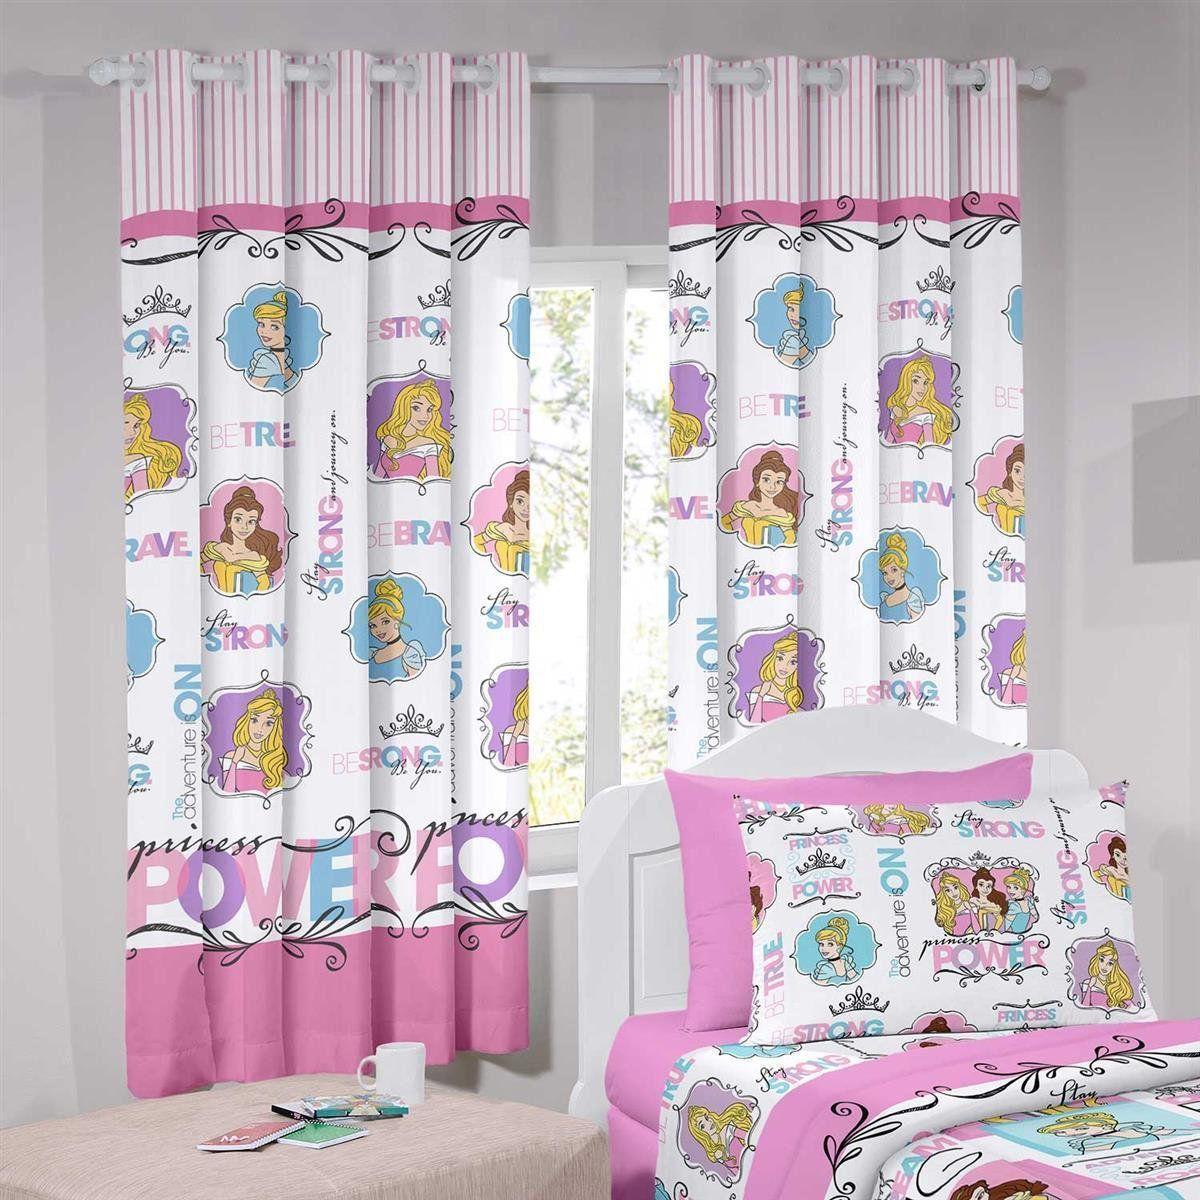 e5be7dd234 Cortina Infantil Curta Disney Princesas 2